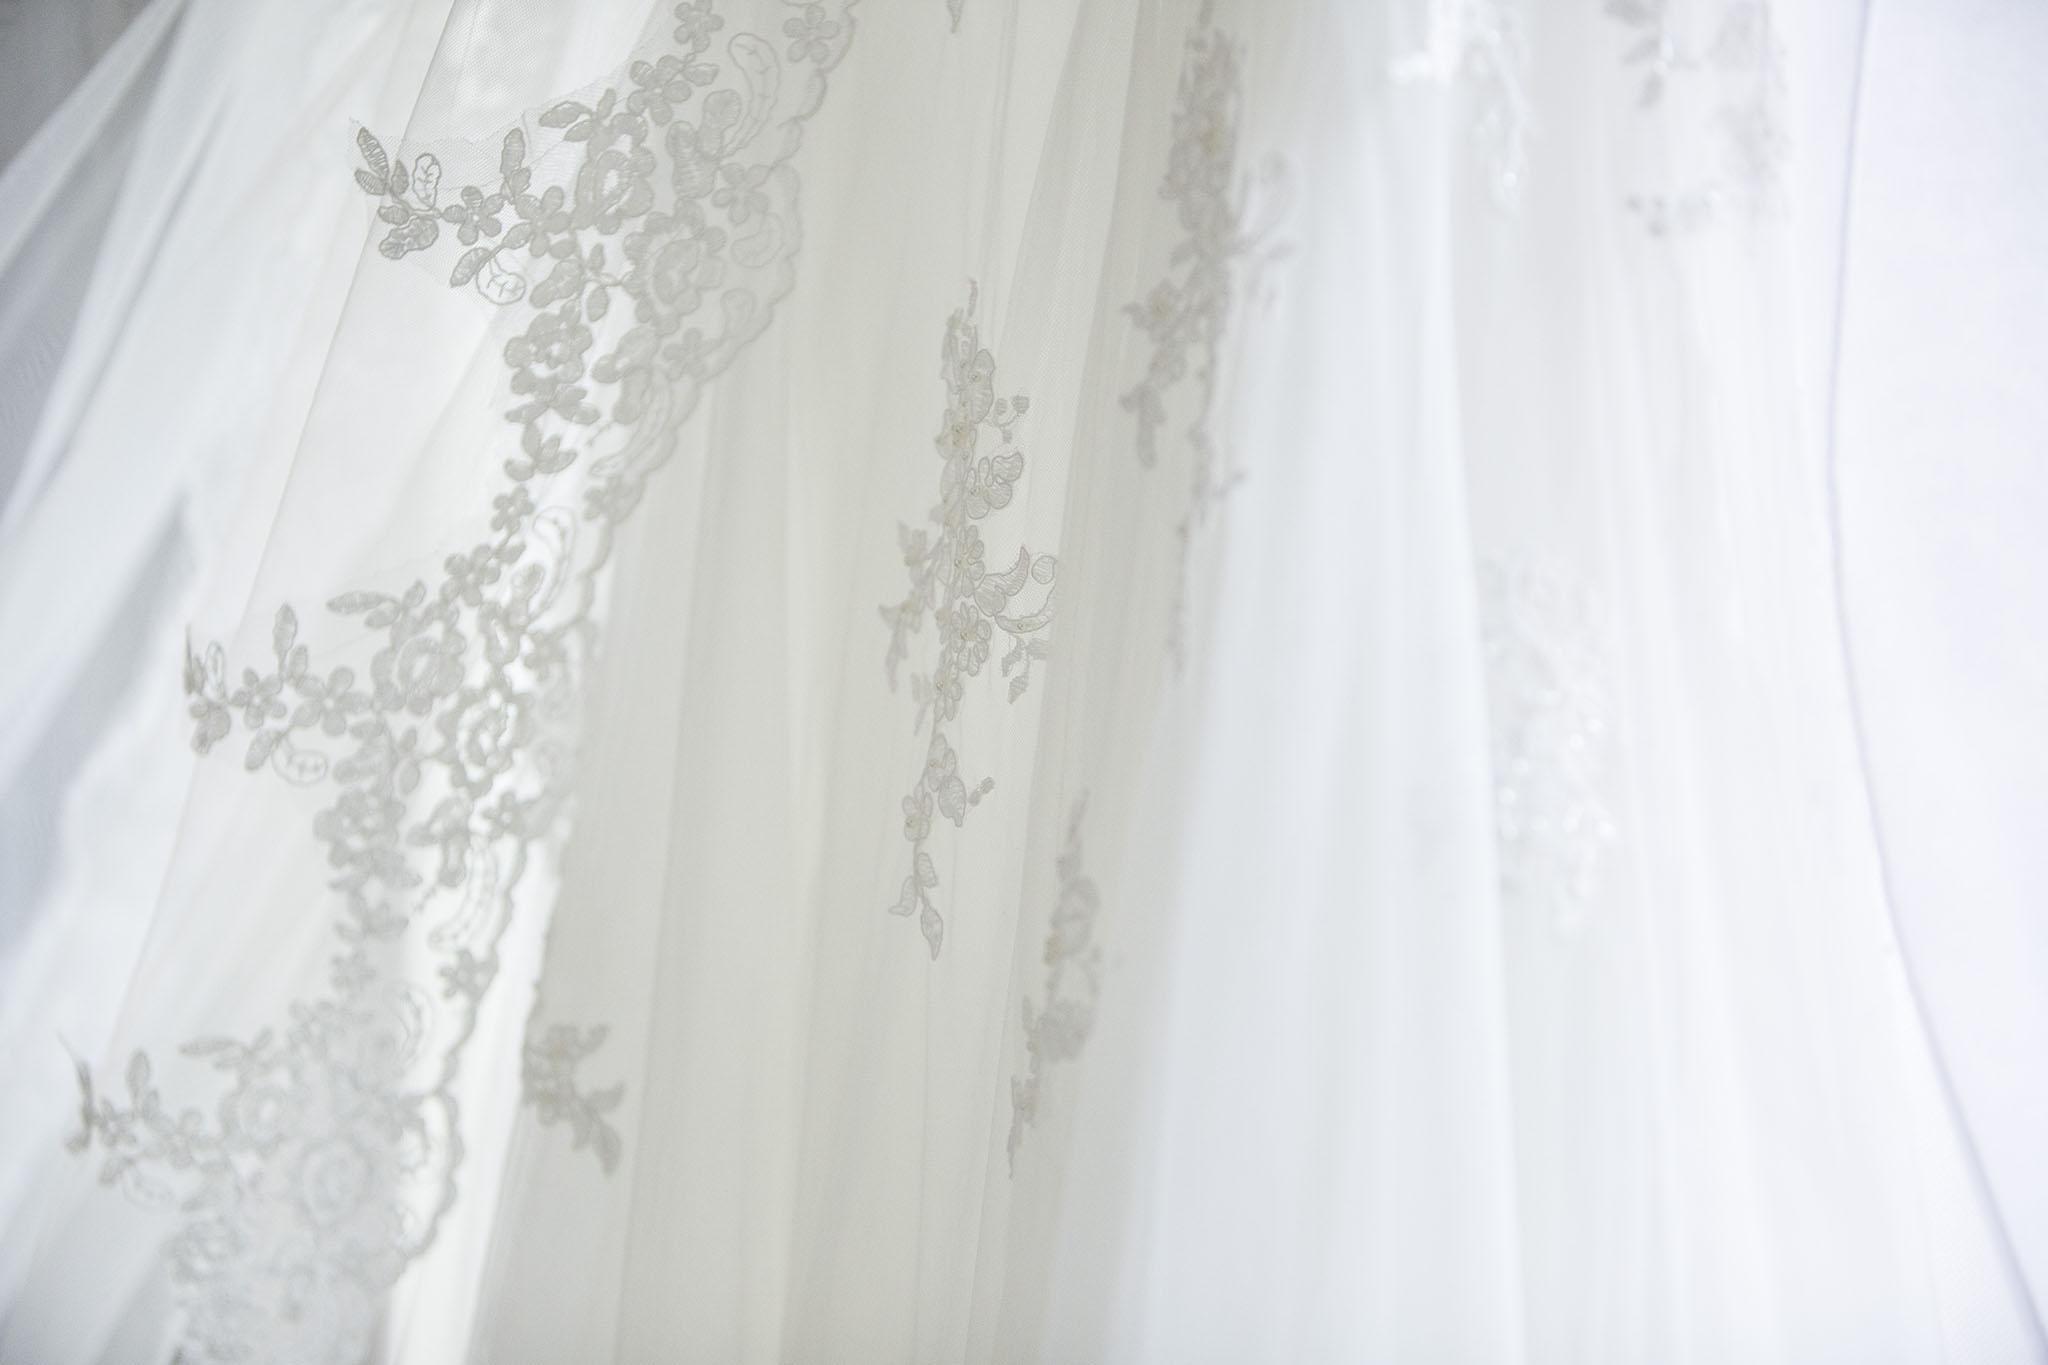 elizabethgphotography_kingslangley_hertfordshire_fineart_wedding_tewinbury_farm_tayna_07.jpg